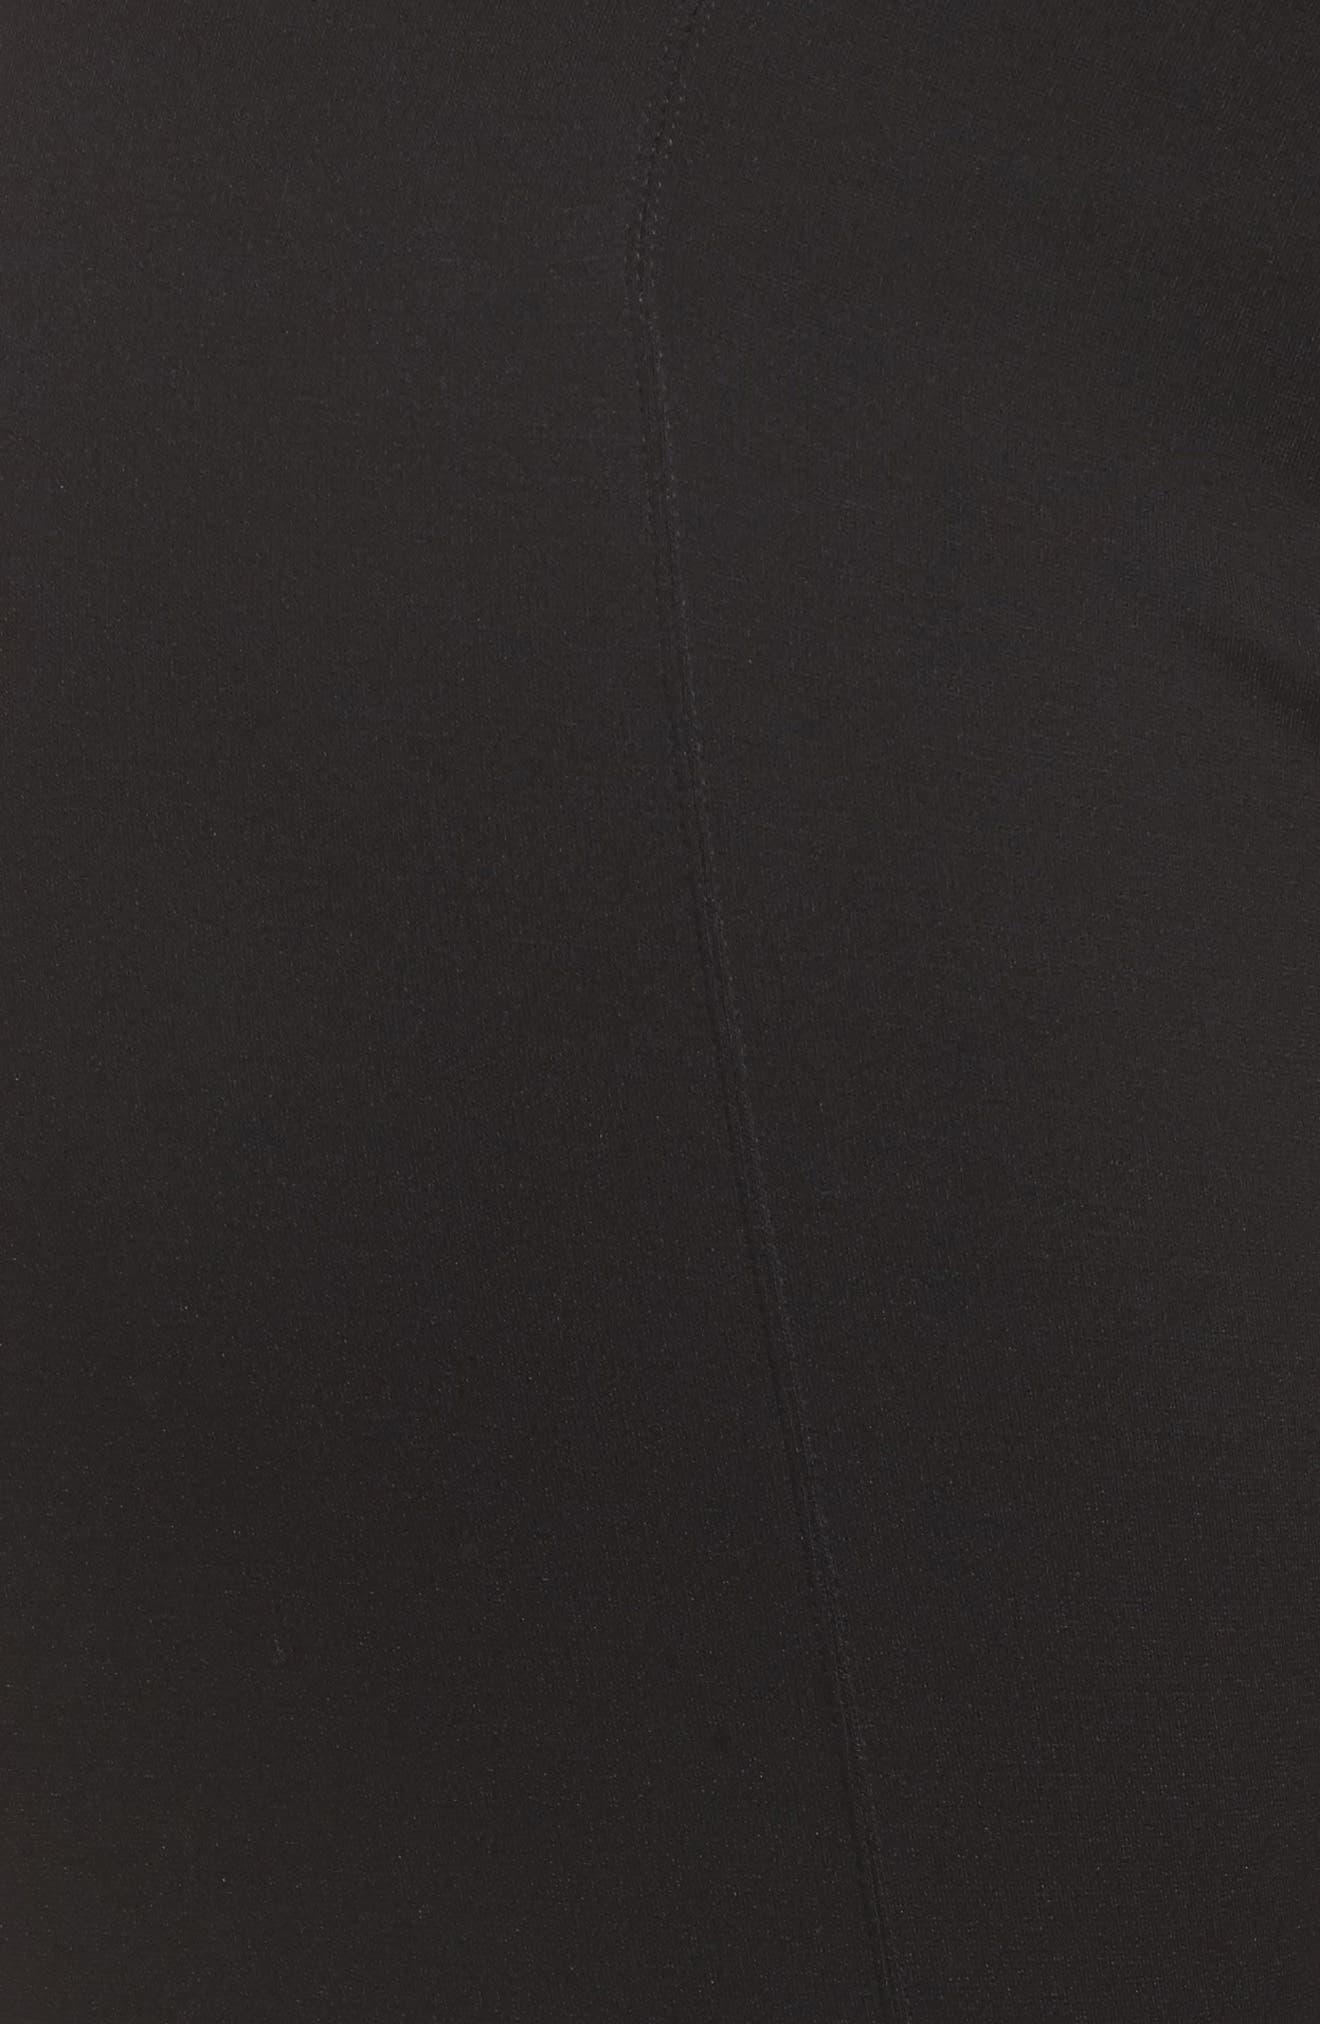 Taylor Capri Leggings,                             Alternate thumbnail 5, color,                             Black